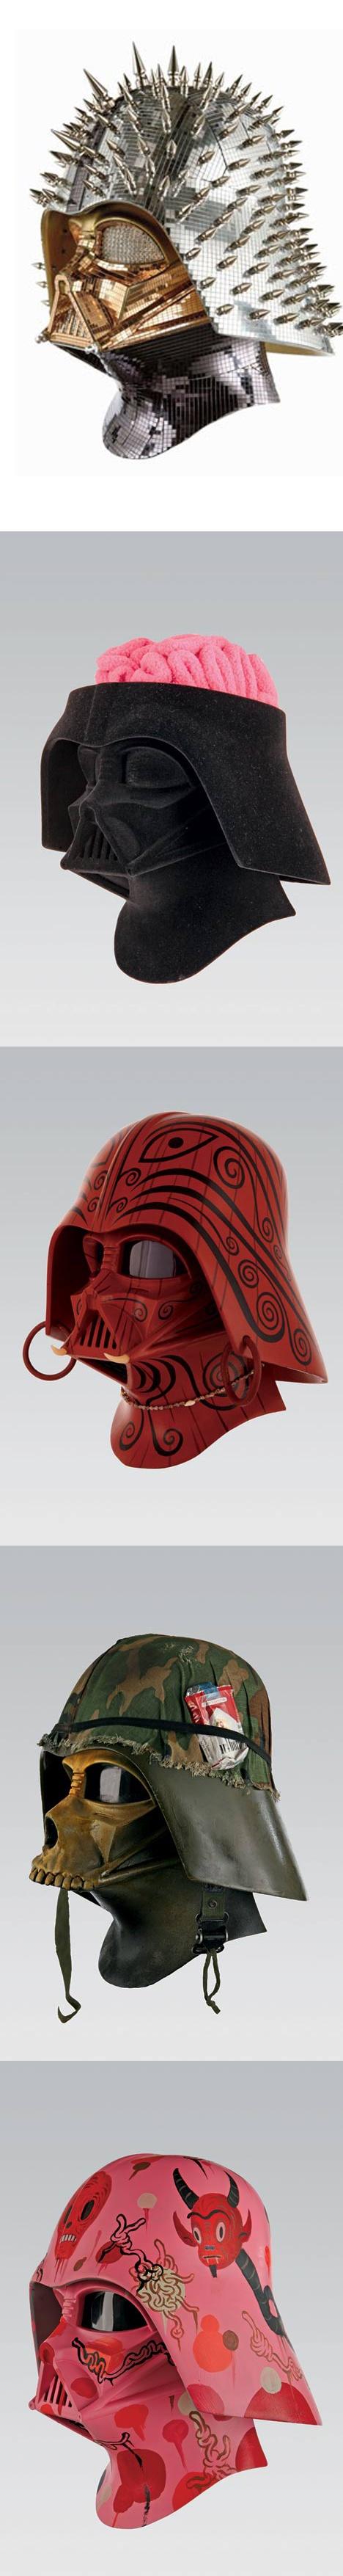 THE 100 HELMETS OF THE VADER PROJECT: PLASTICGOD: Bling, Temple, Darth Vader, Vader Helmets, Project Starwars, Vader S Helmet, Star Wars But, 100 Helmets, Andy Warhol